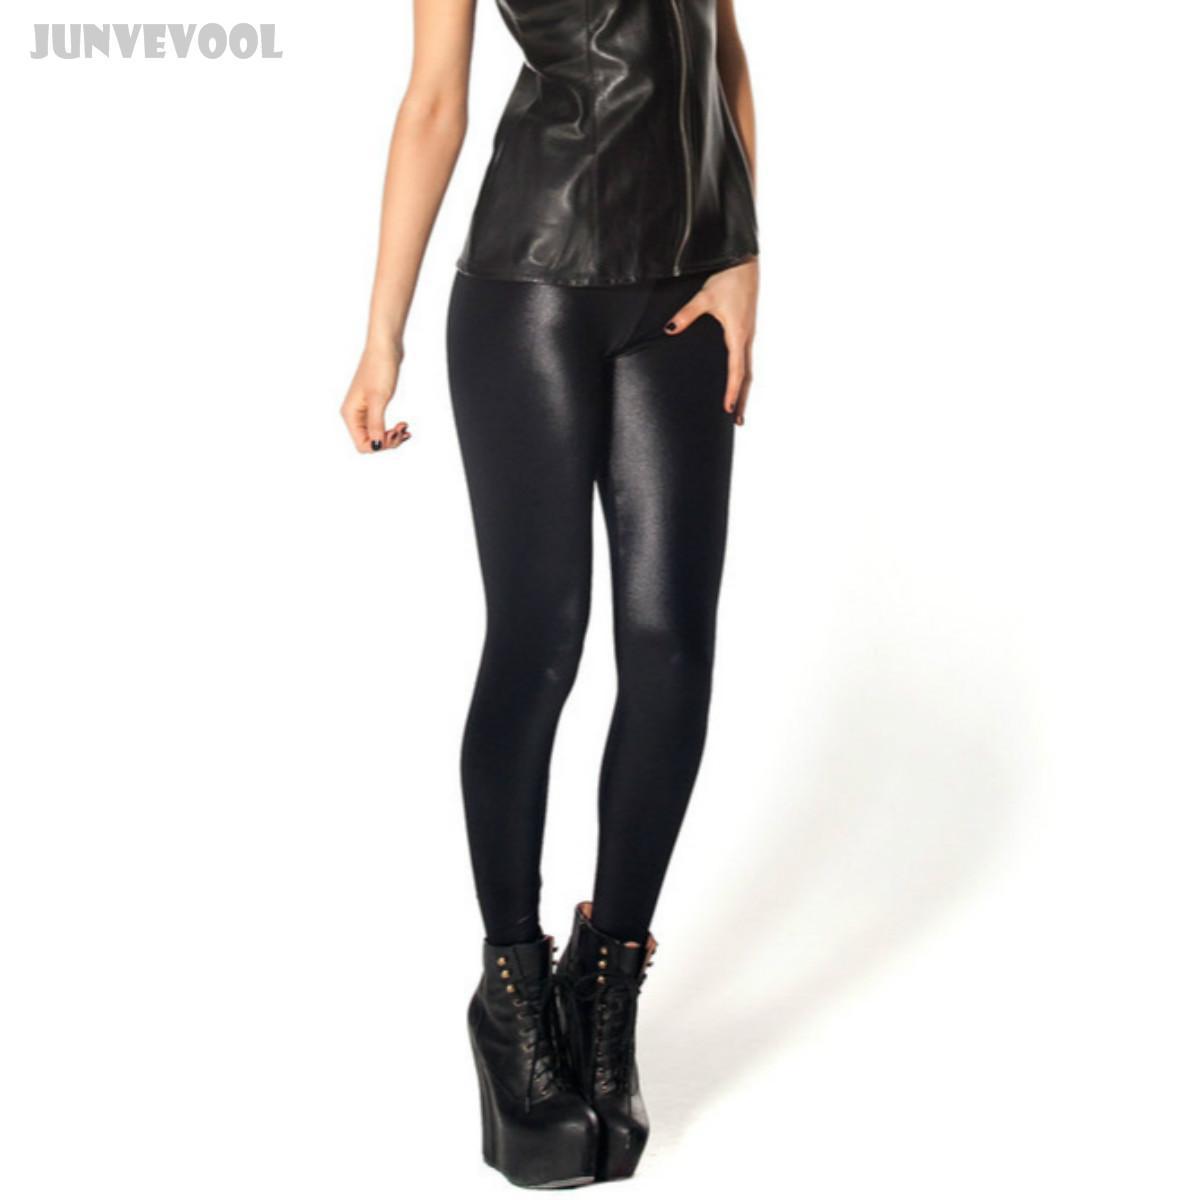 4b48d310e8f86 2019 Wholesale Imitation Leather Leggings Joggings Women Black Fitness Pants  Sexy Women Mid Waist Wet Look Shinny Slim Trousers Plus Size Lady From ...